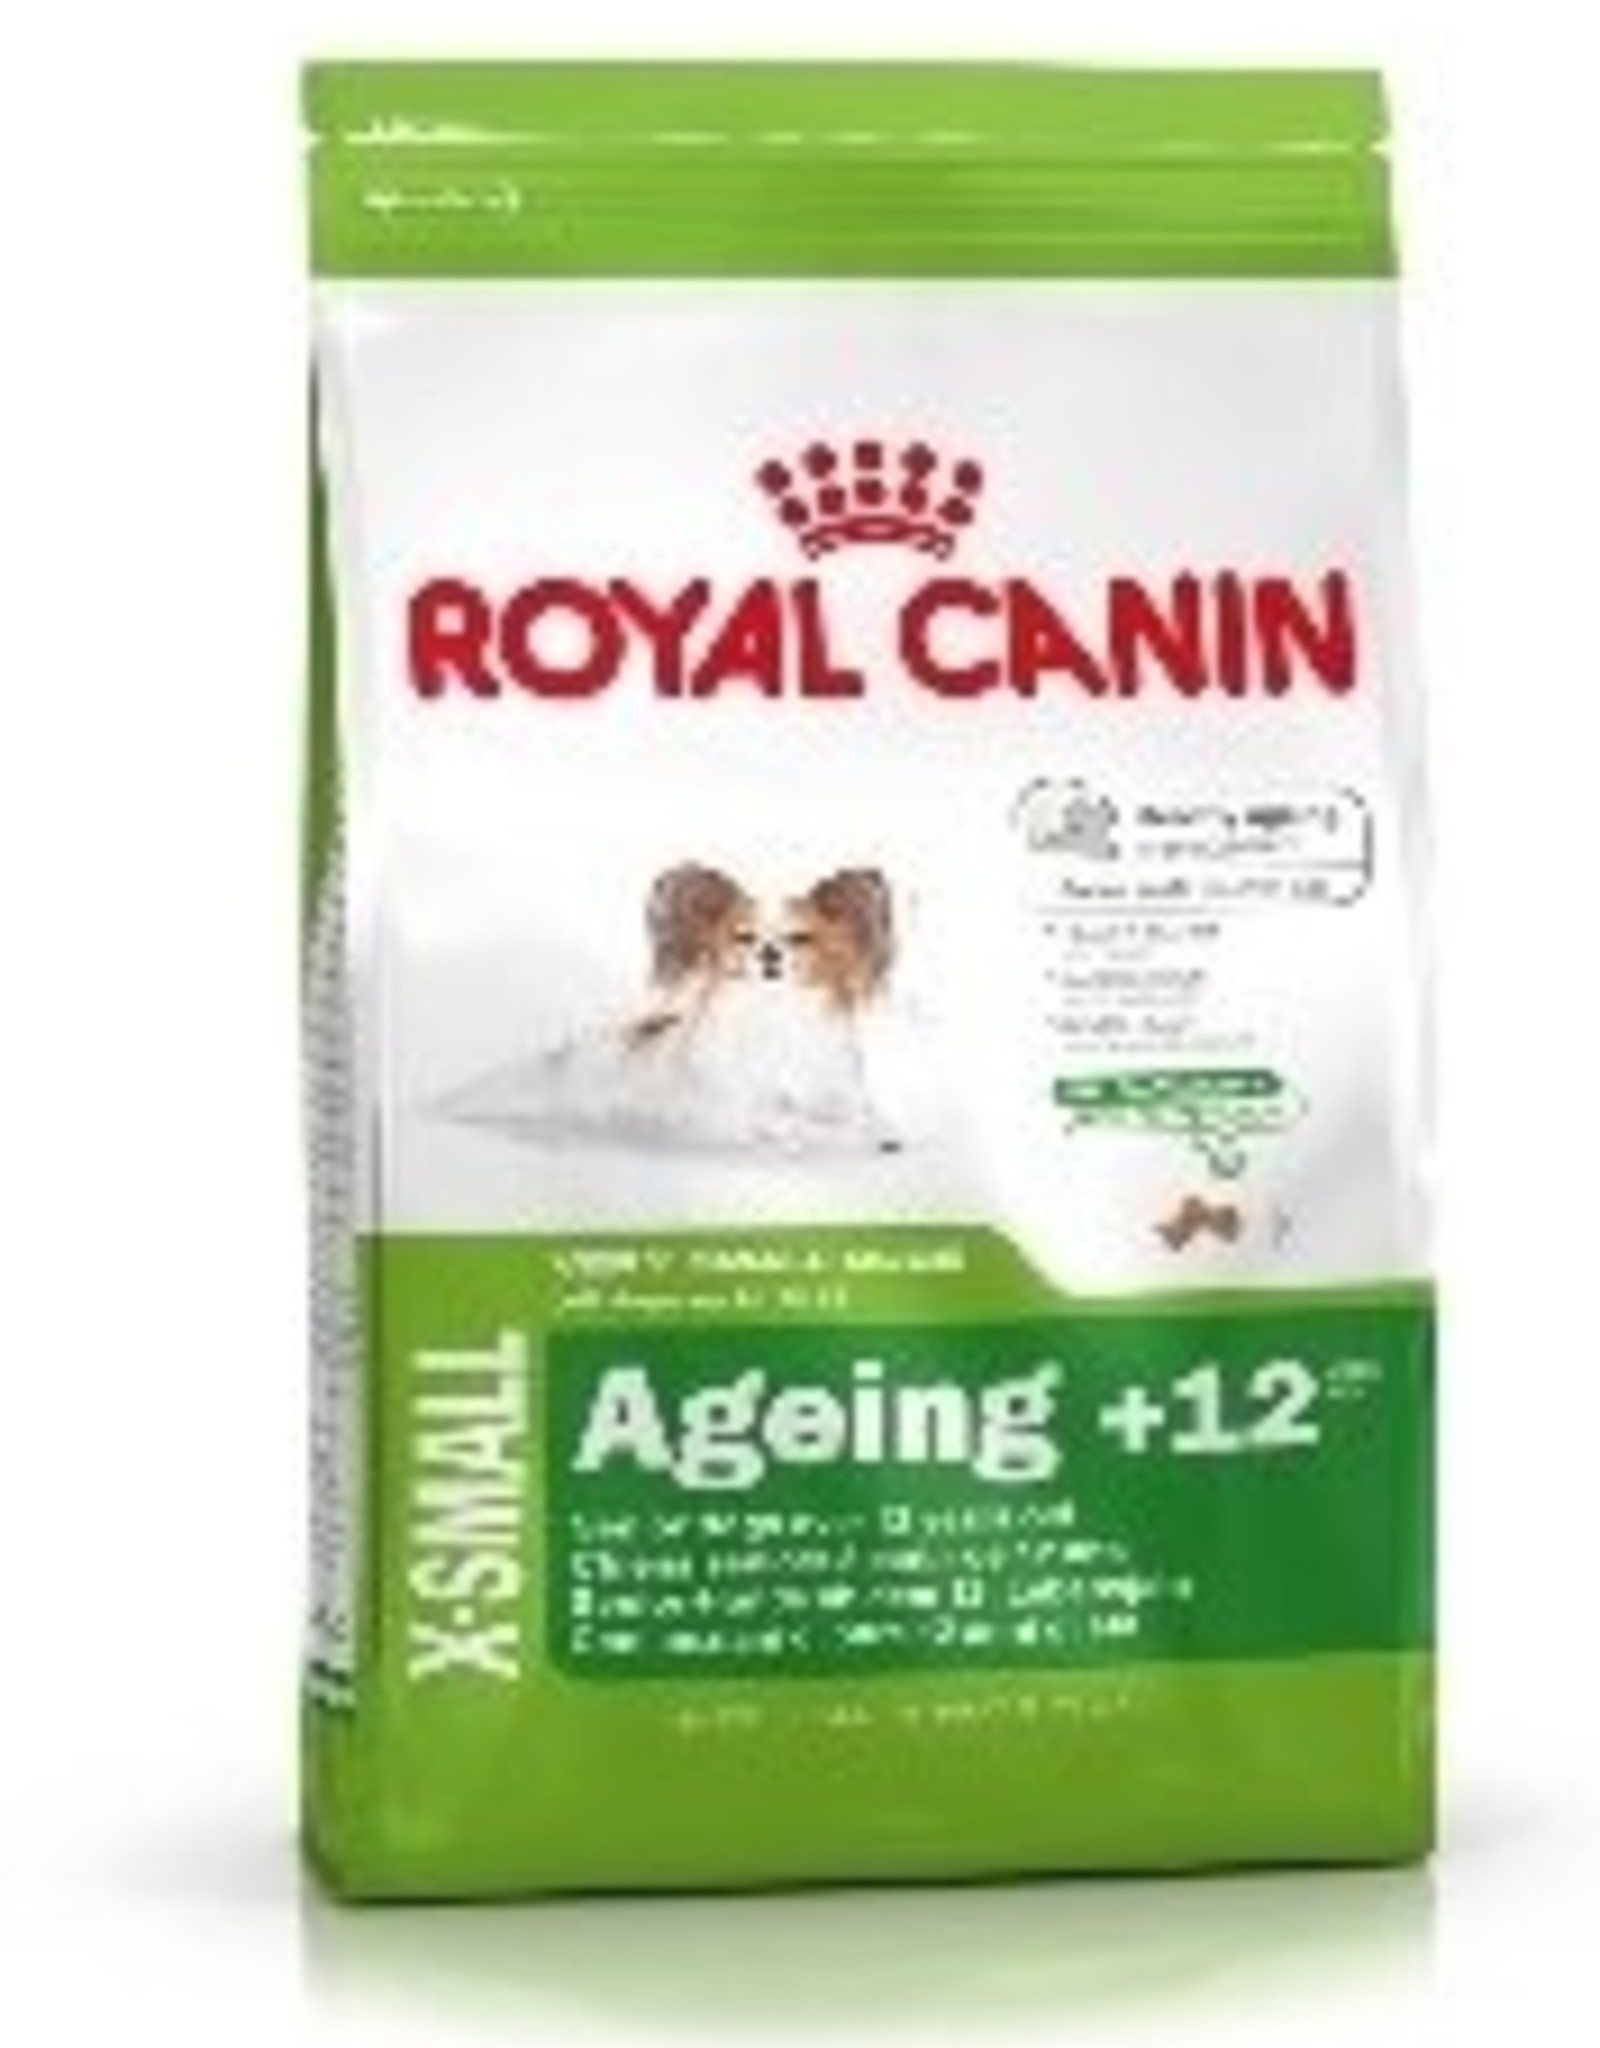 Royal Canin Royal Canin Shn X Small Mature 12+ Hond 0,5kg